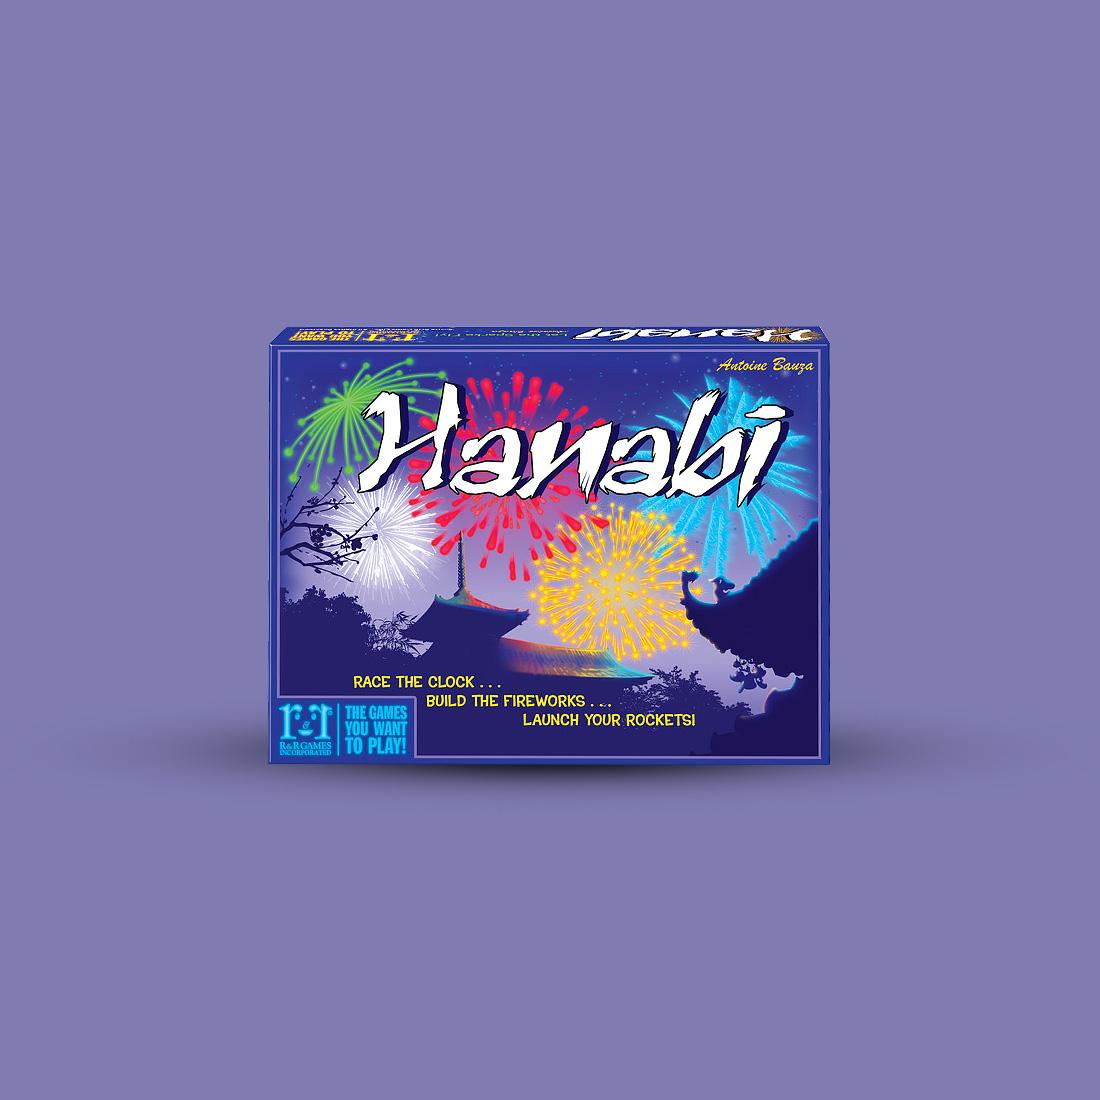 hanabi-family-game-card-game-box.jpg